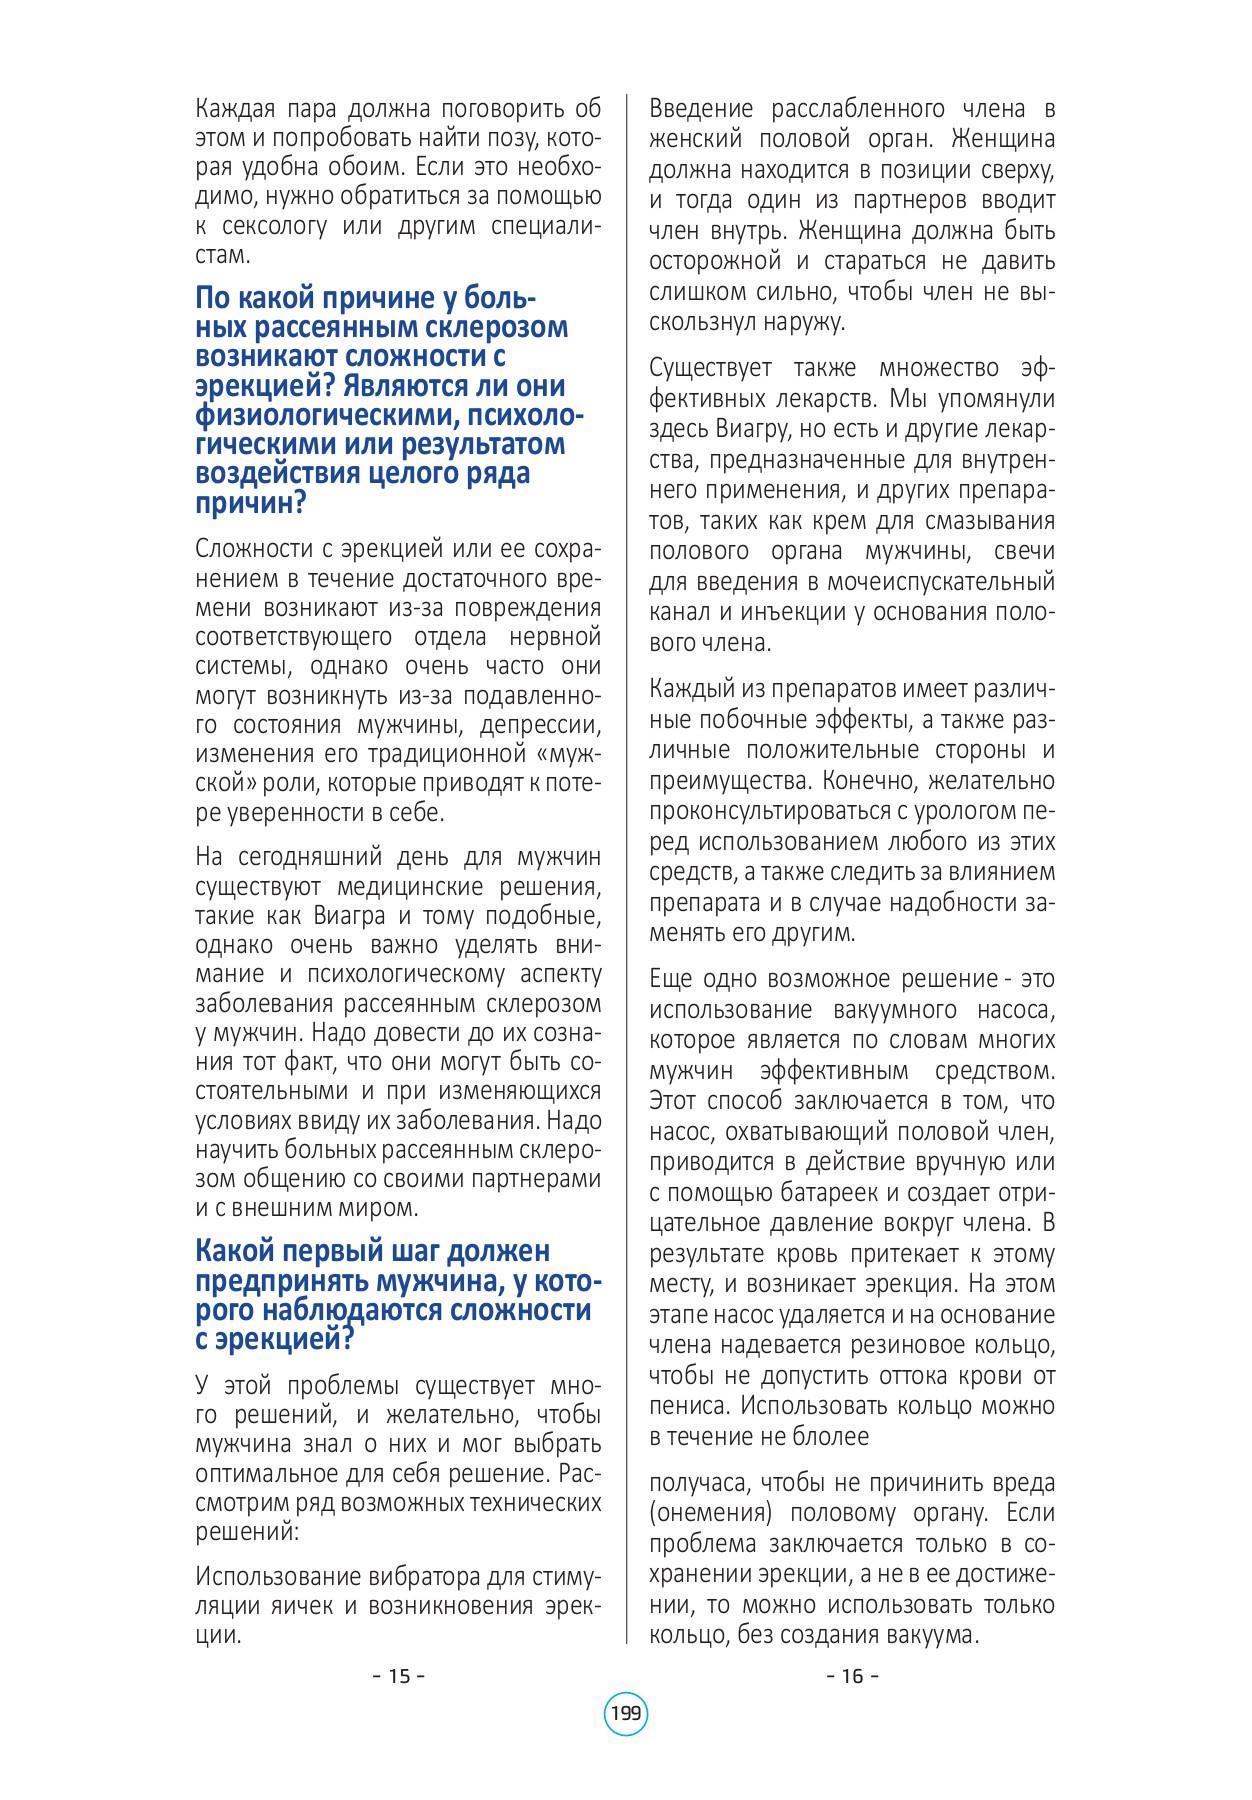 Condyloma jelentése magyarul » DictZone Orvosi-Magyar szótár